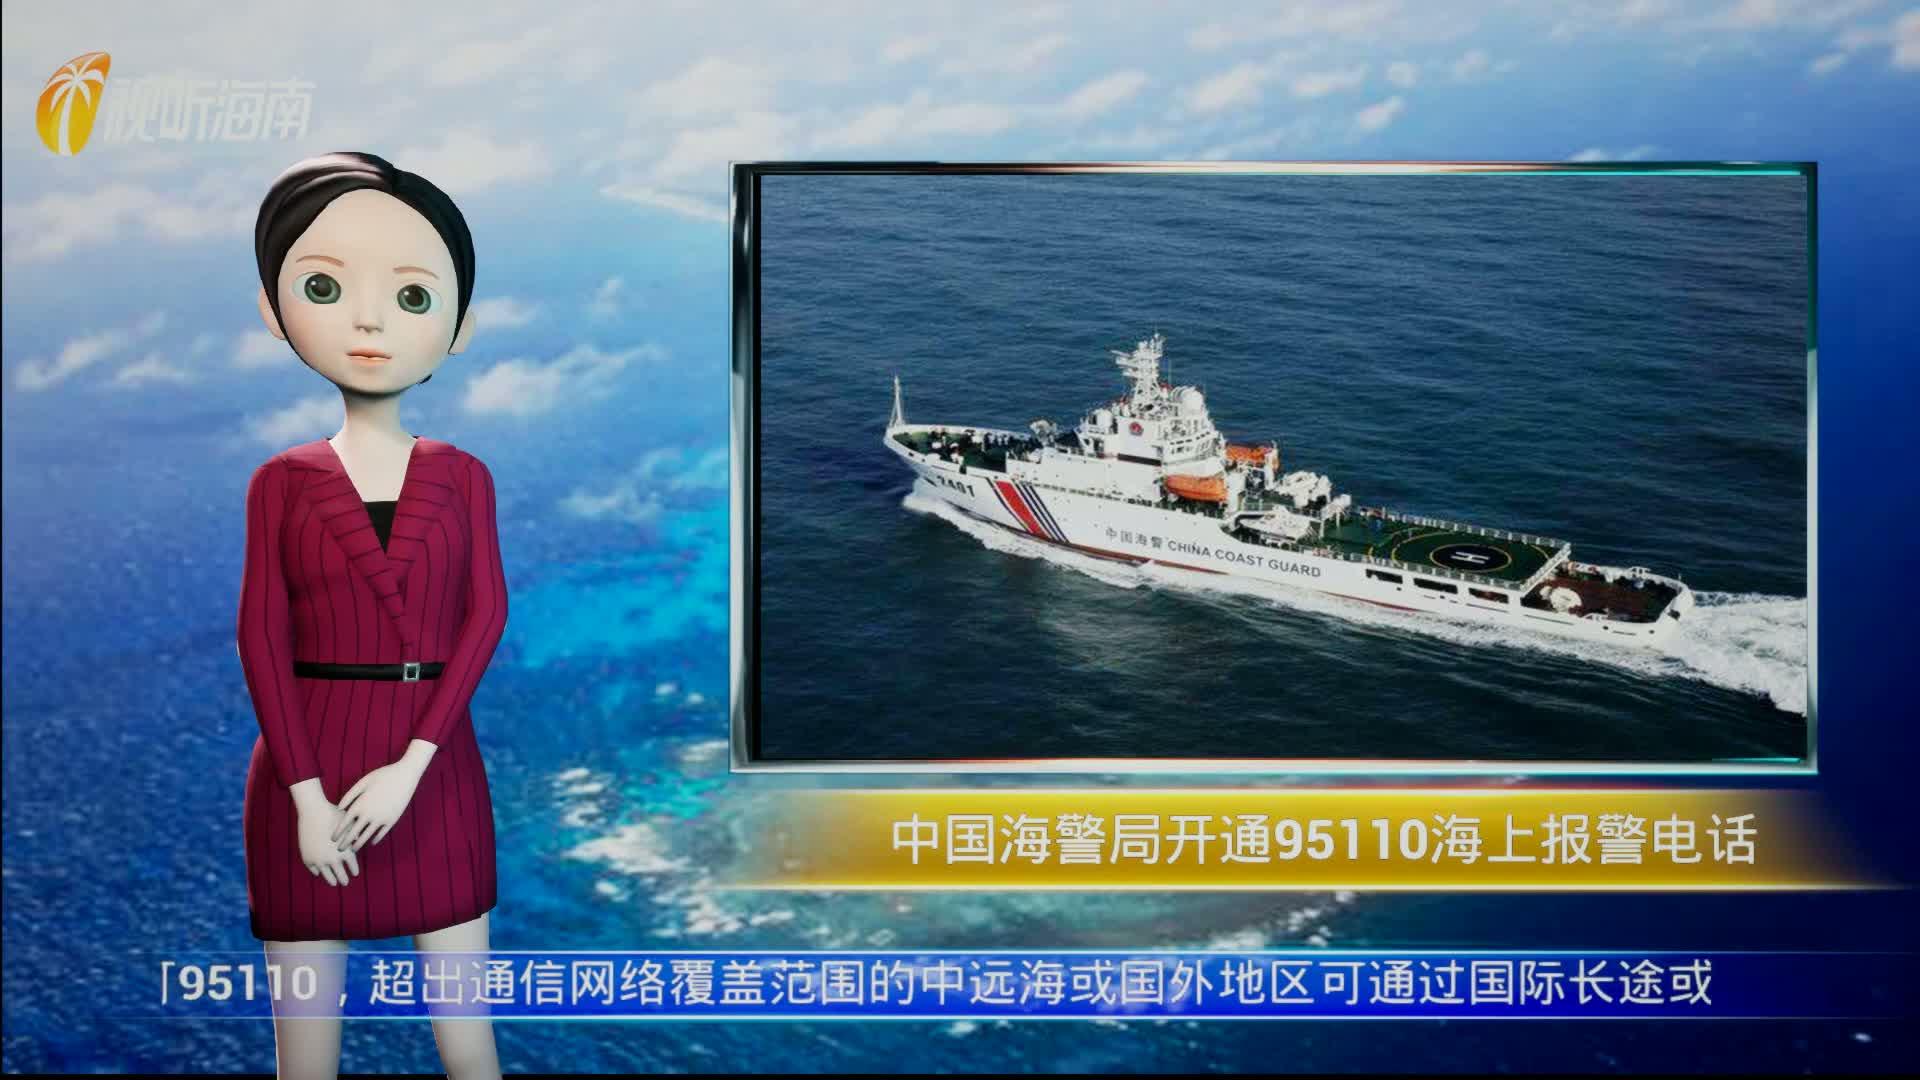 AI播报 中国海警局开通95110海上报警电话